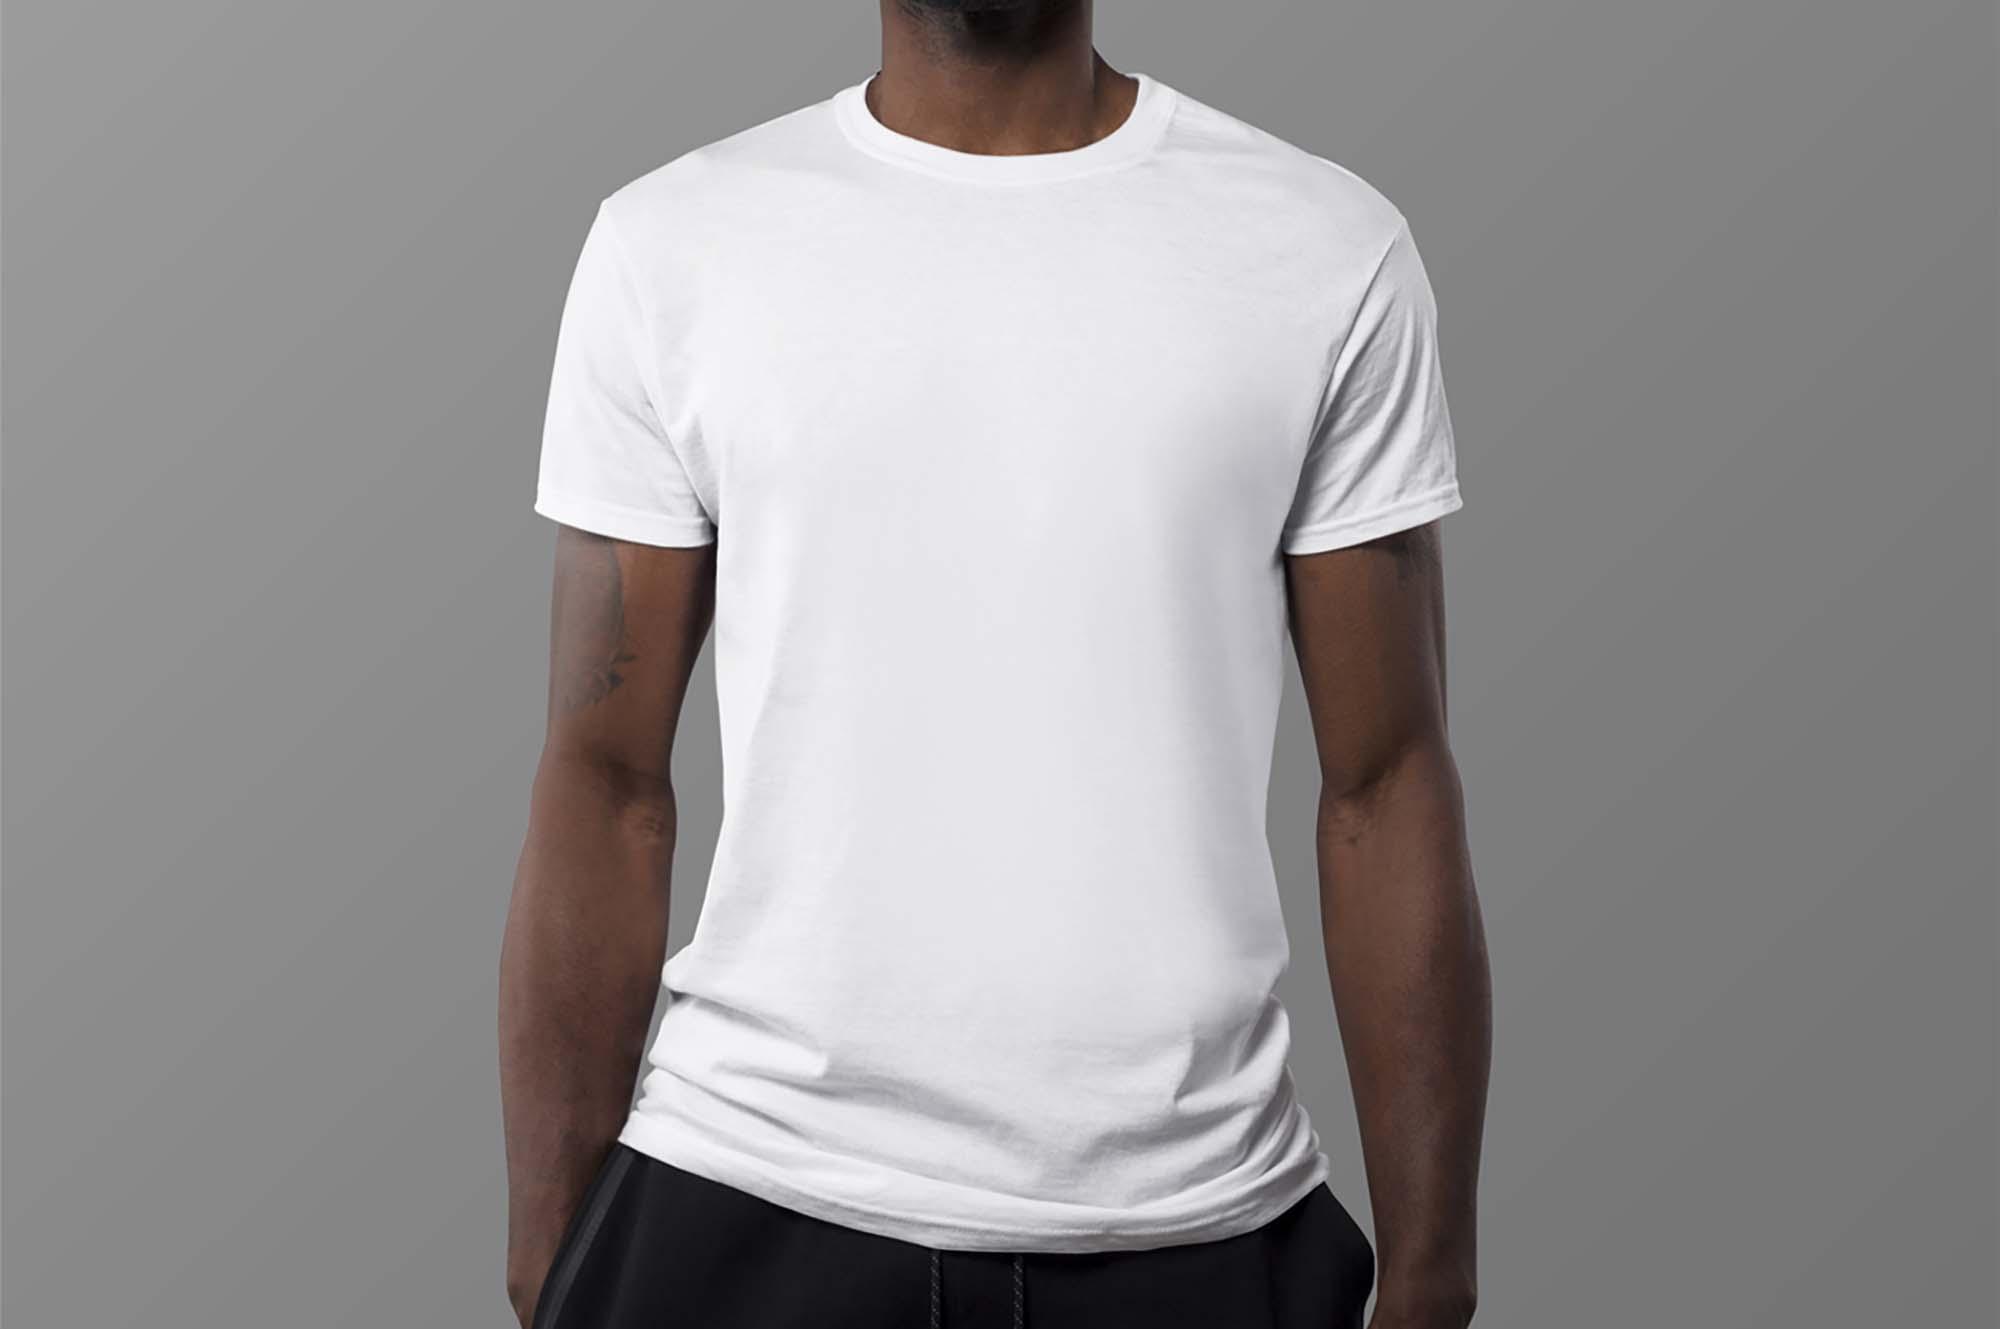 Black Man T-Shirt Mockup 2